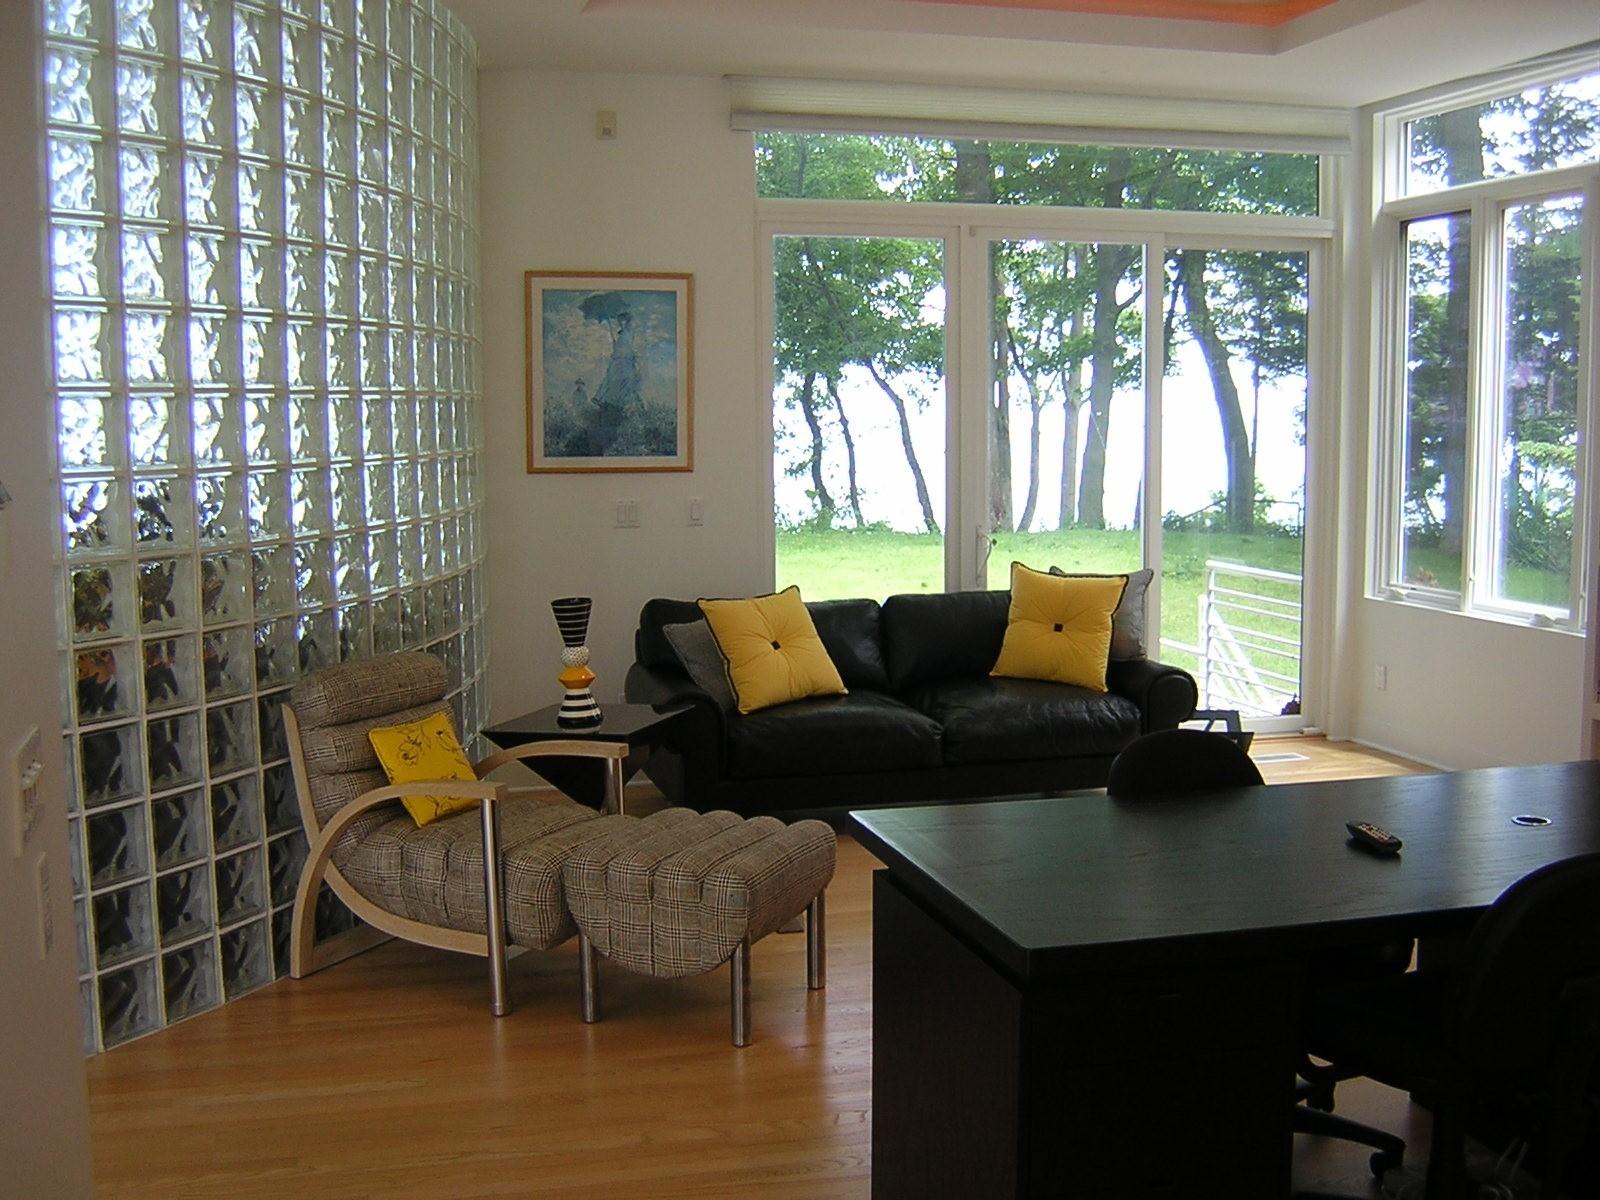 Real Estate Photography - 15930 Lake Ave, Union Pier, MI, 49129 - Location 6